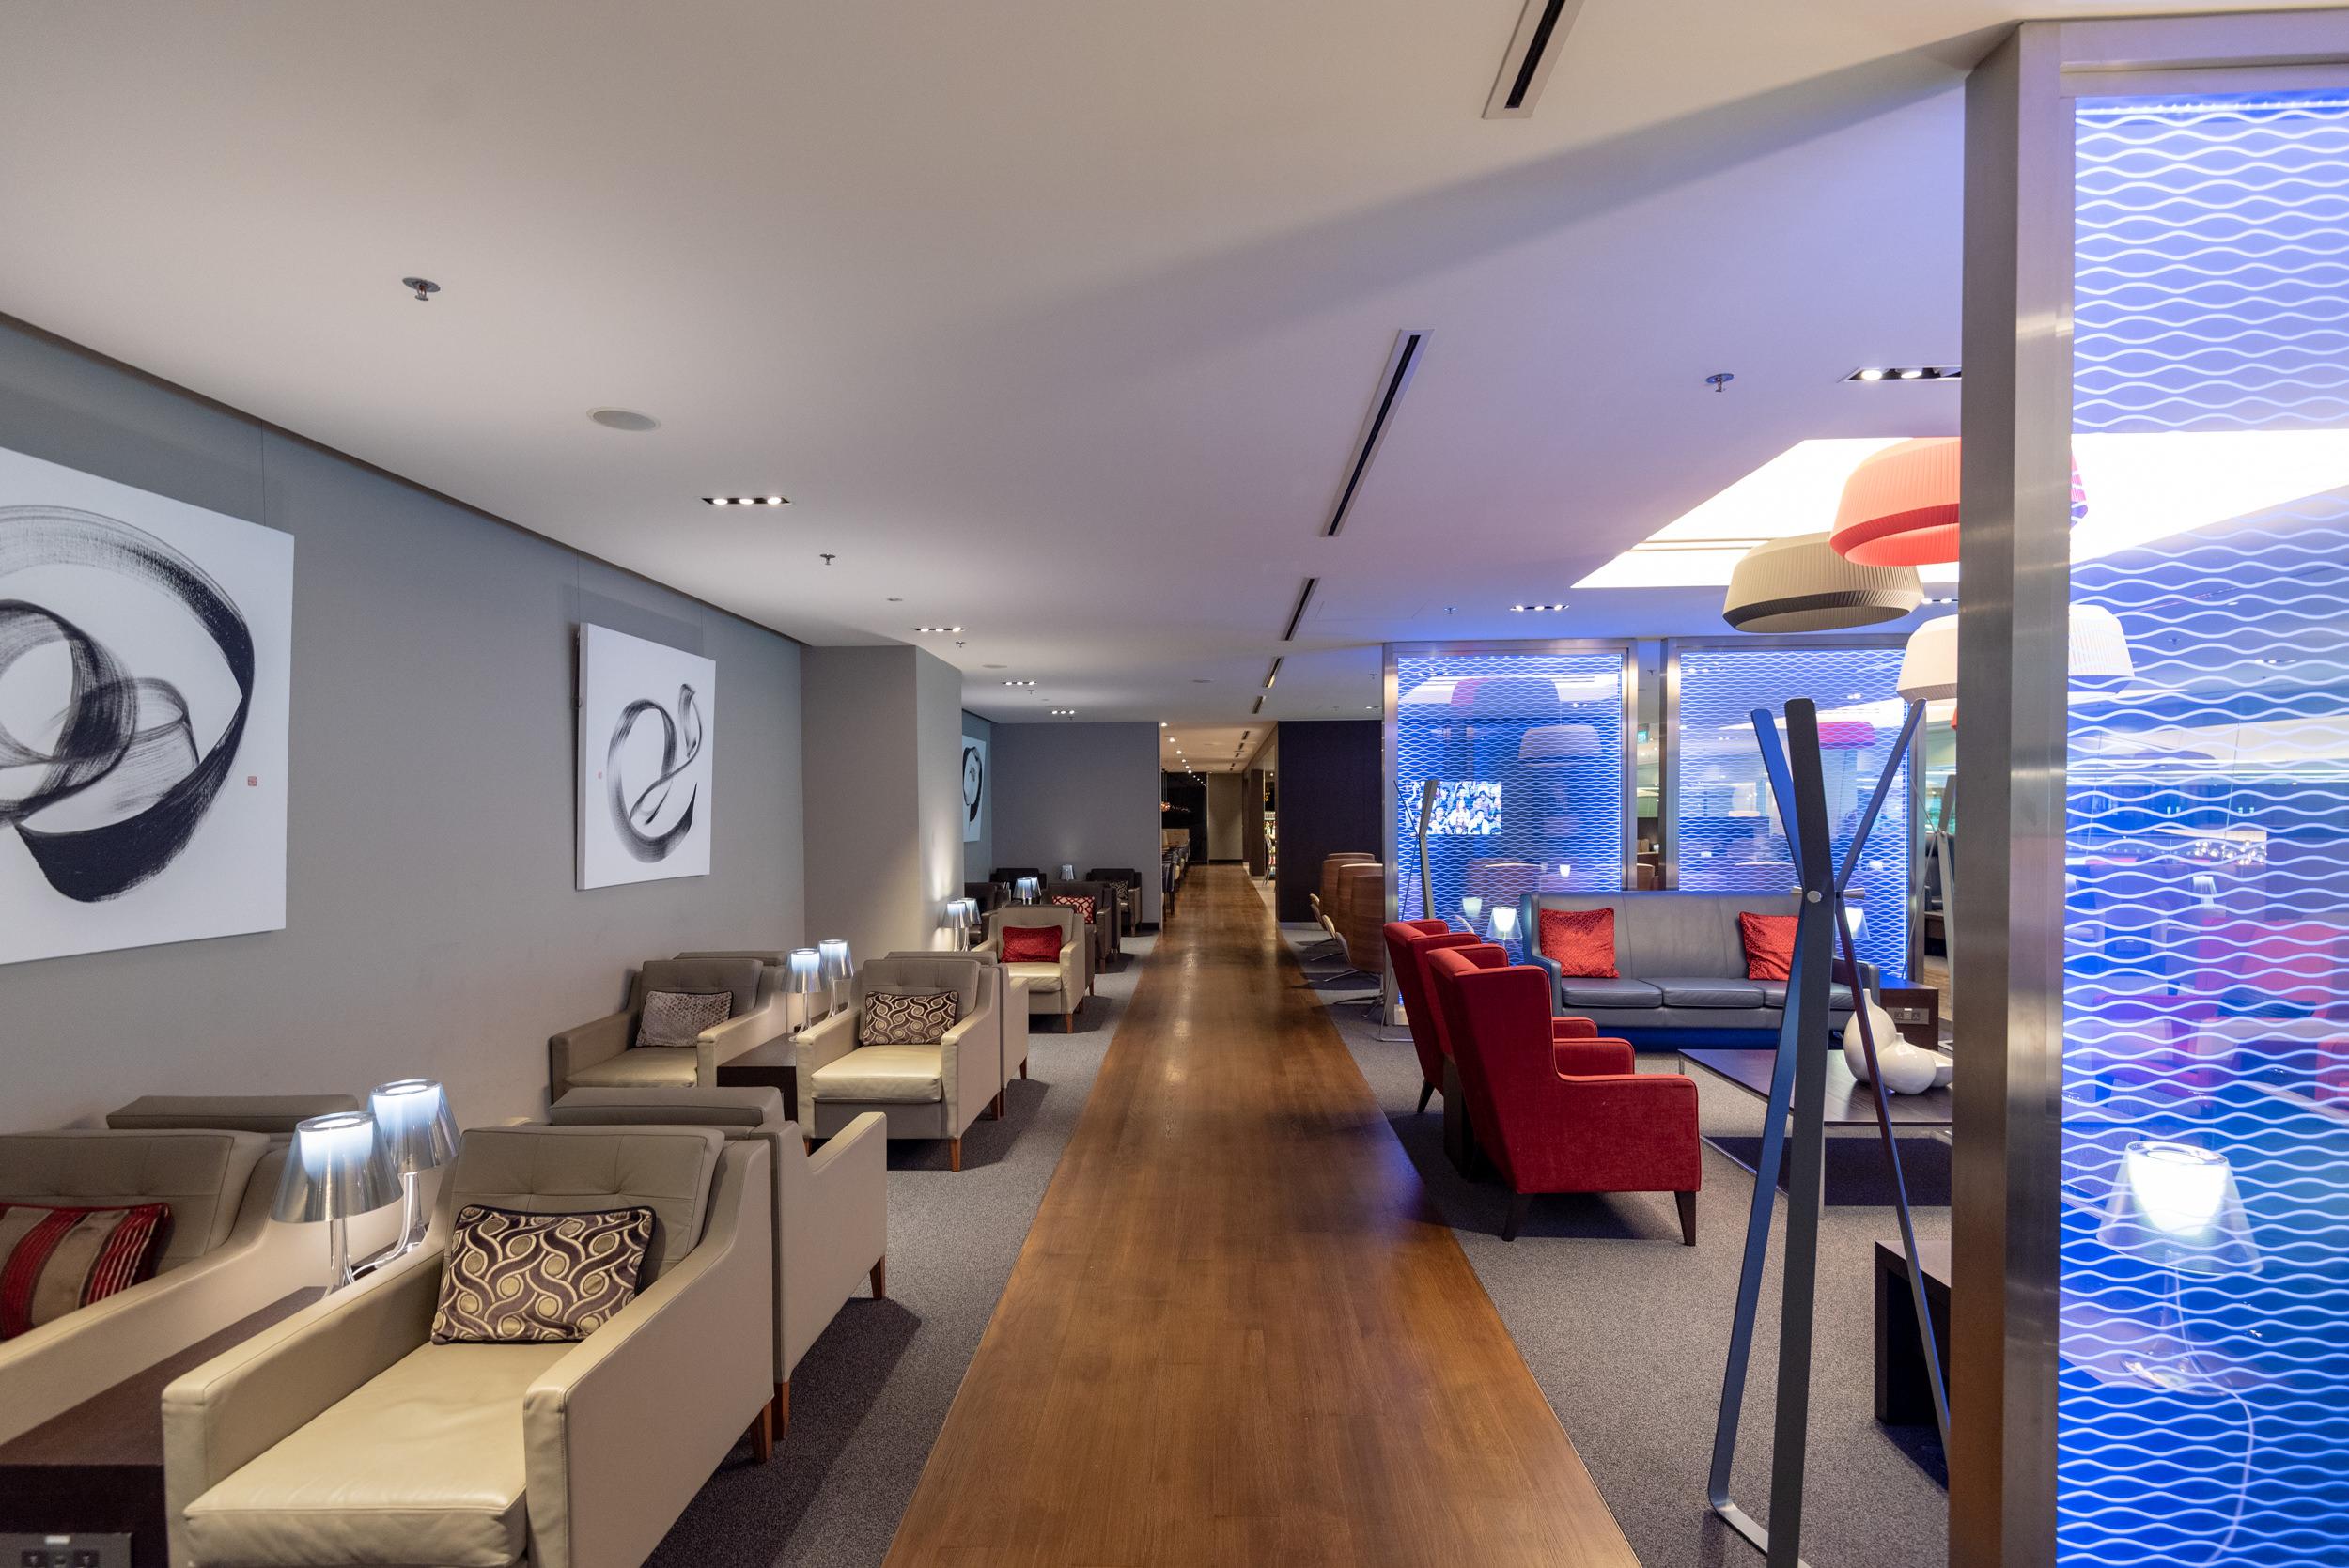 Interiors  British Airways Lounge and Concorde Bar - Singapore Changi Airport (SIN)